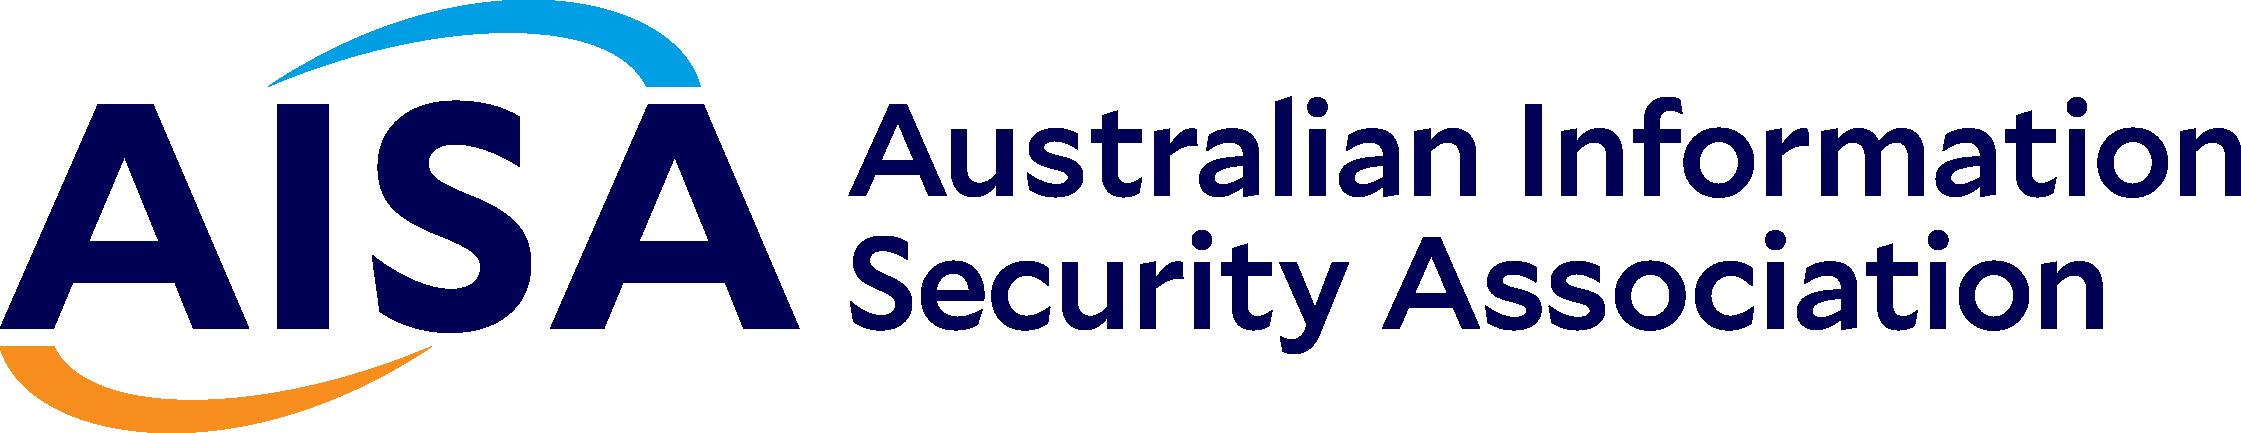 AISA Australian Information Security Association logo